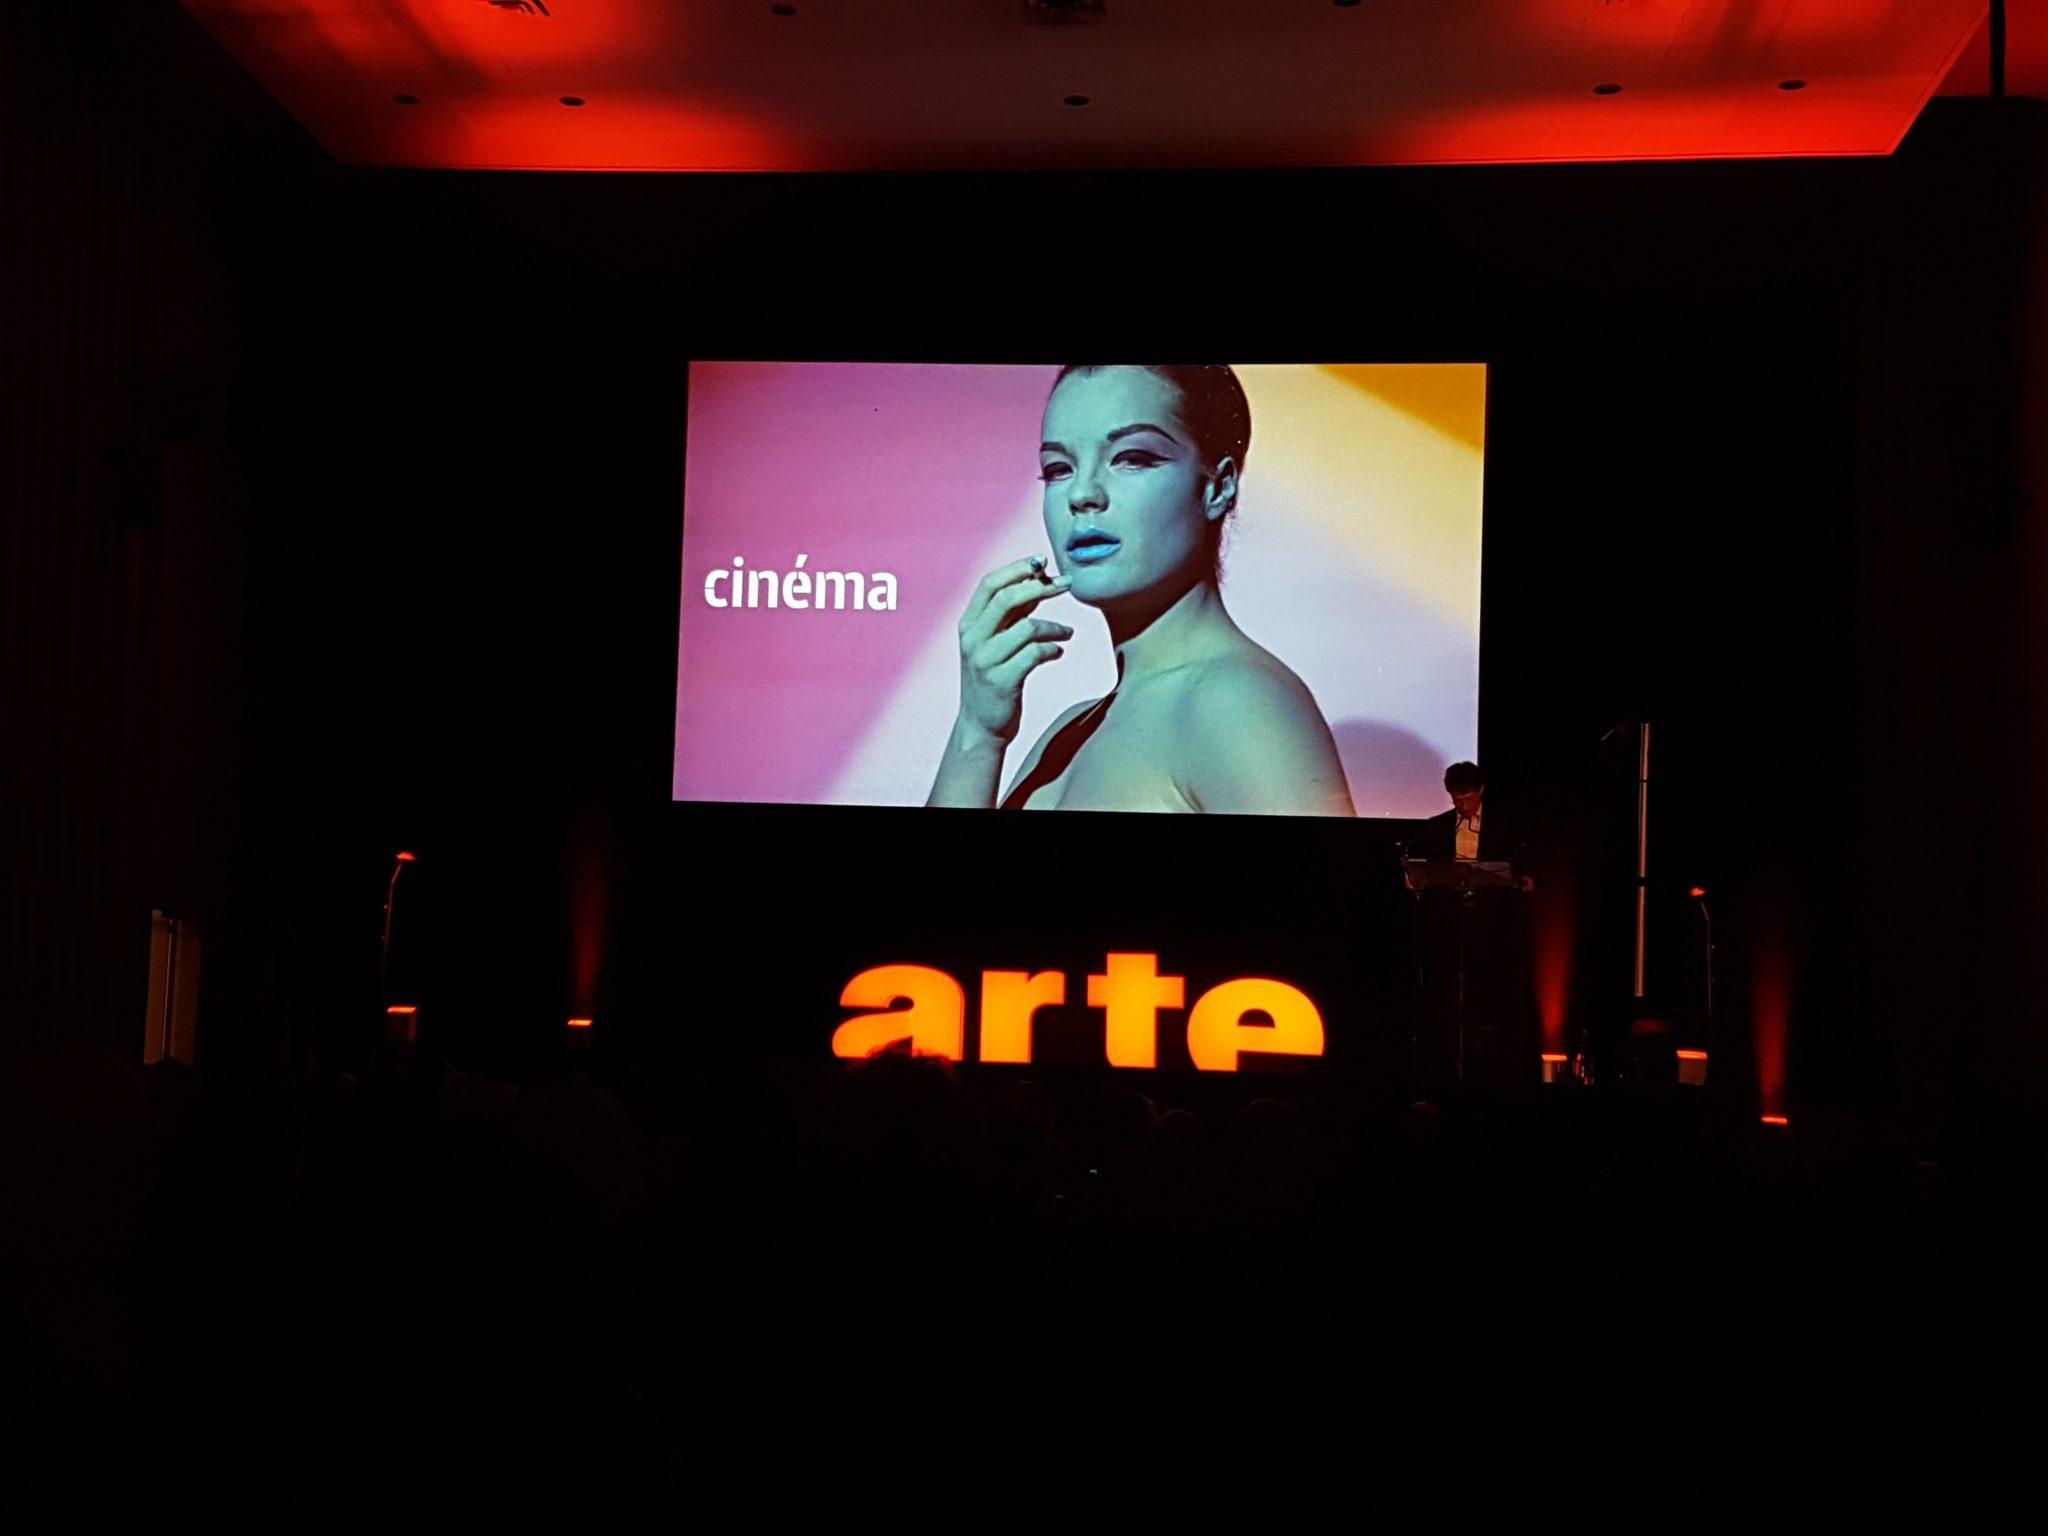 ARTE rentrée 2017 image cinéma